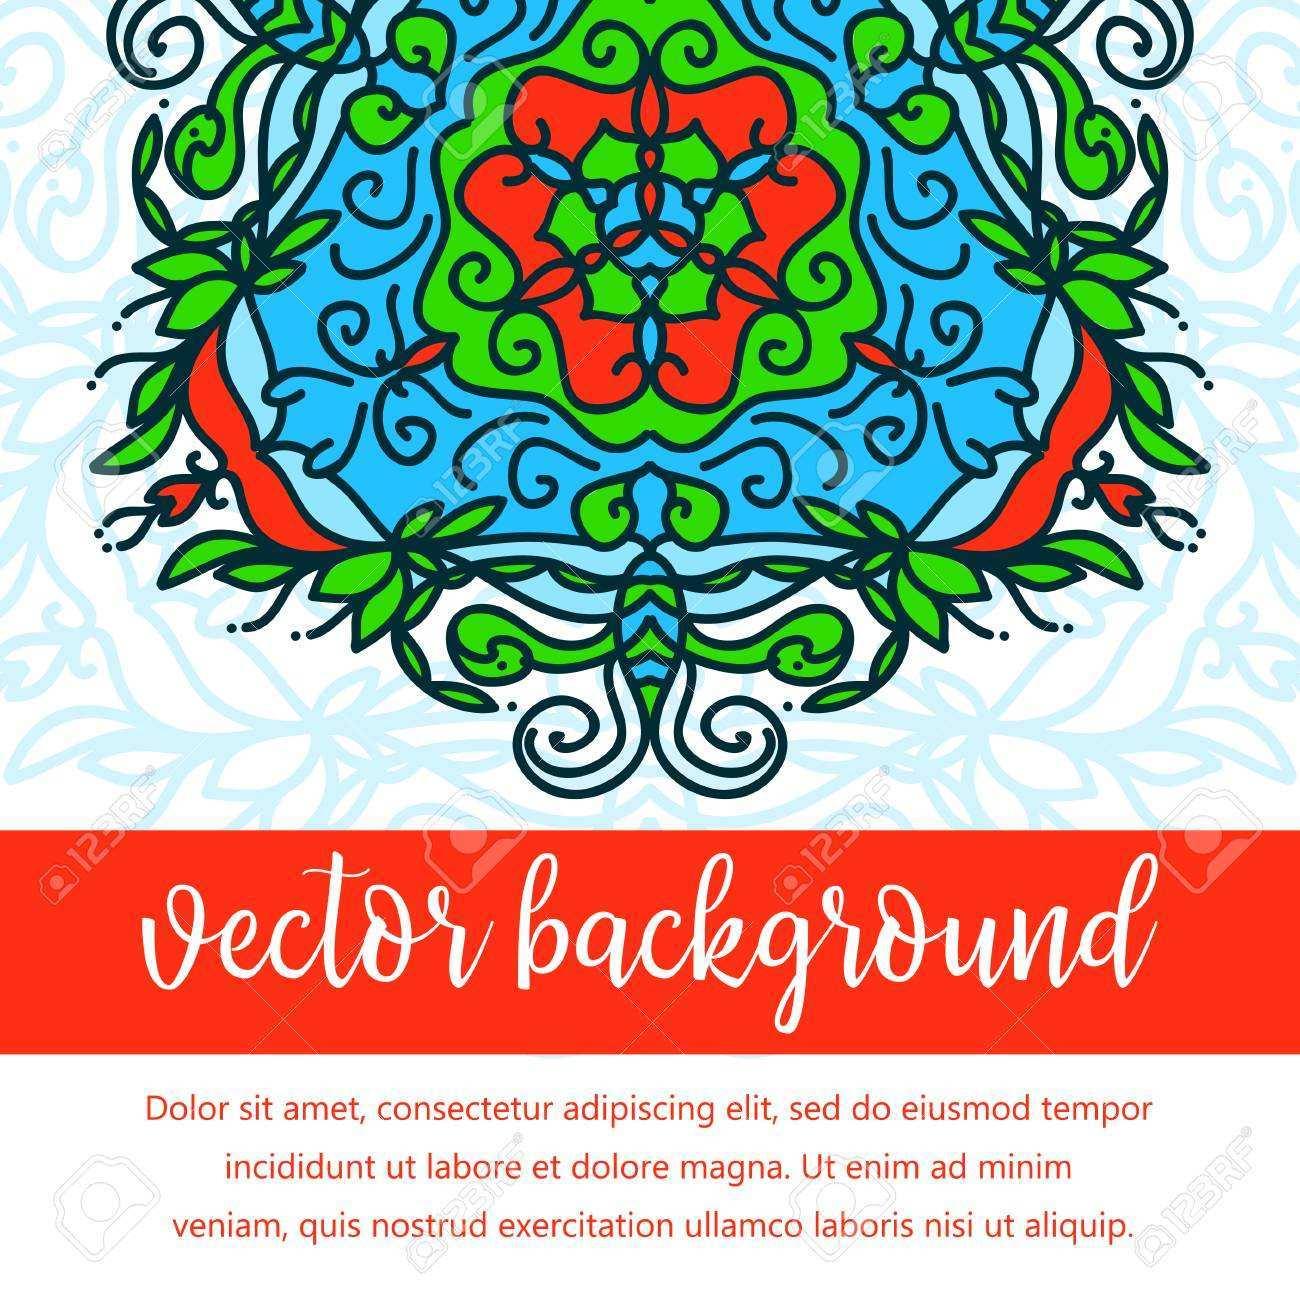 36 Free Printable Vector Invitation Template Vector Download with Vector Invitation Template Vector